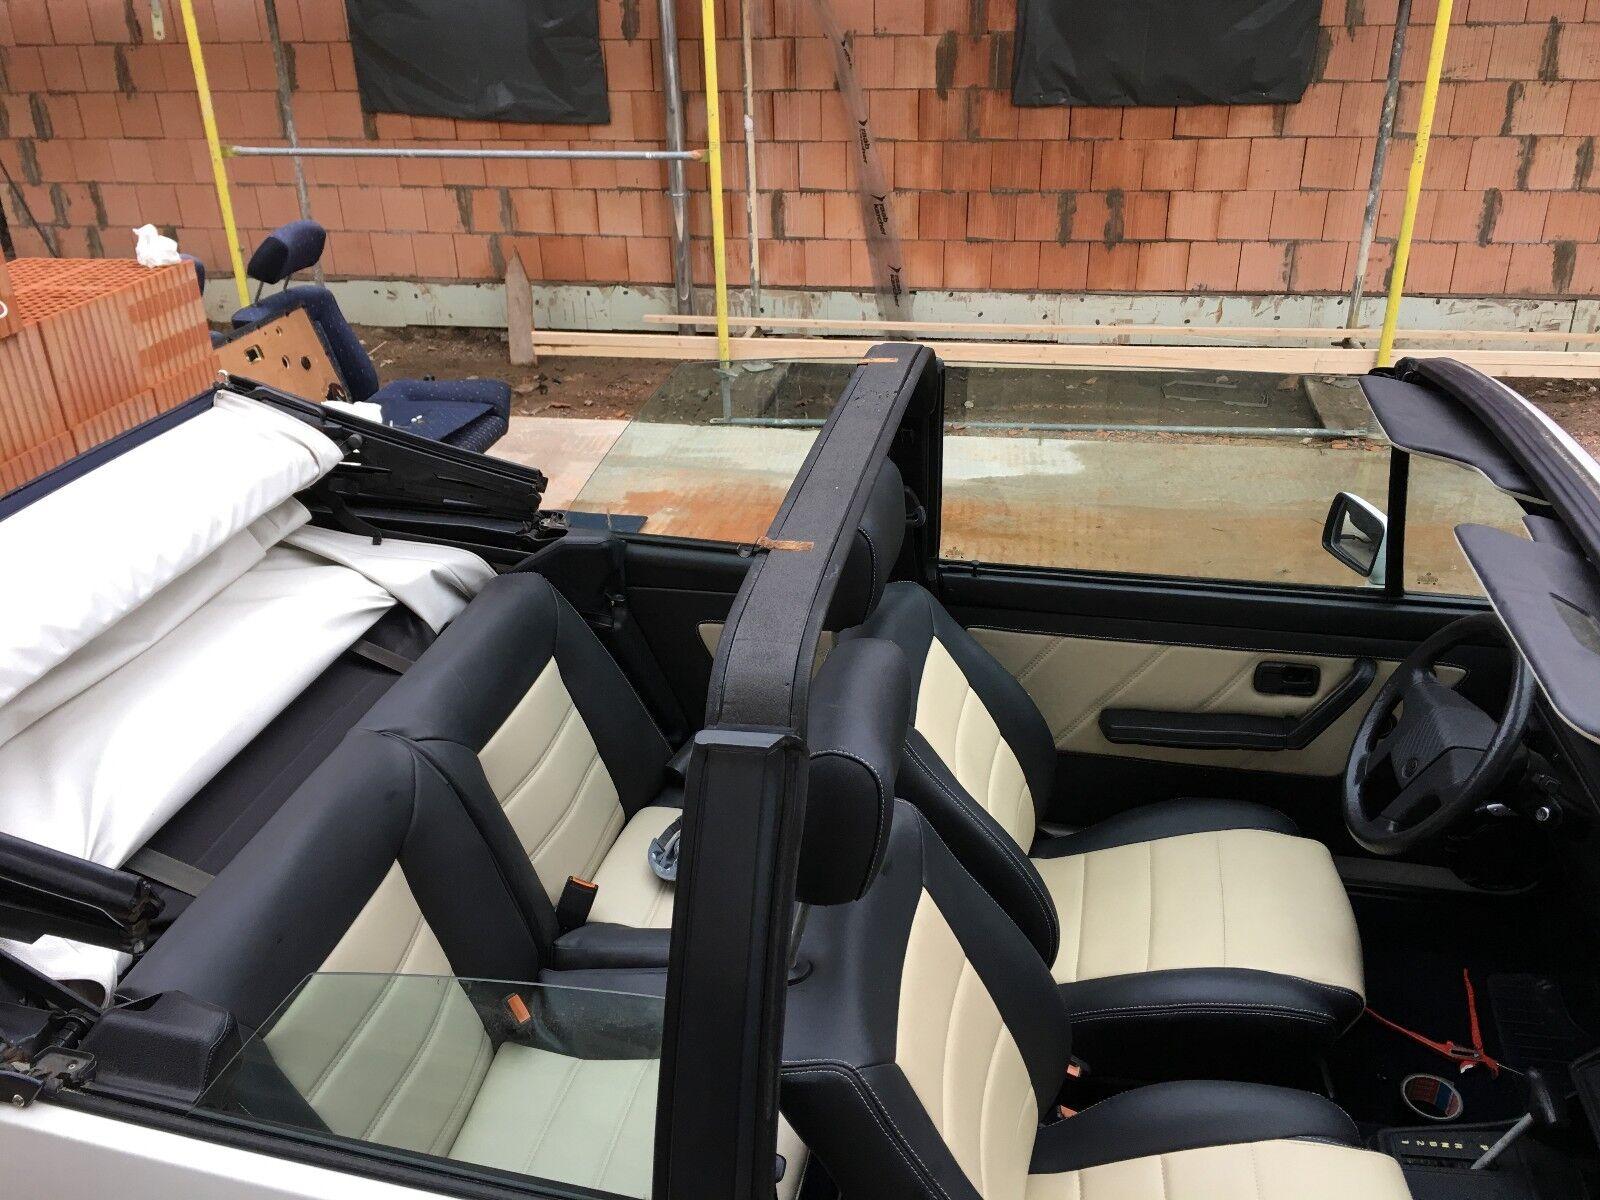 Golf 1 Cabriolet Automatik - technisch wie neu! Verschleißteile/Innenausst. NEU